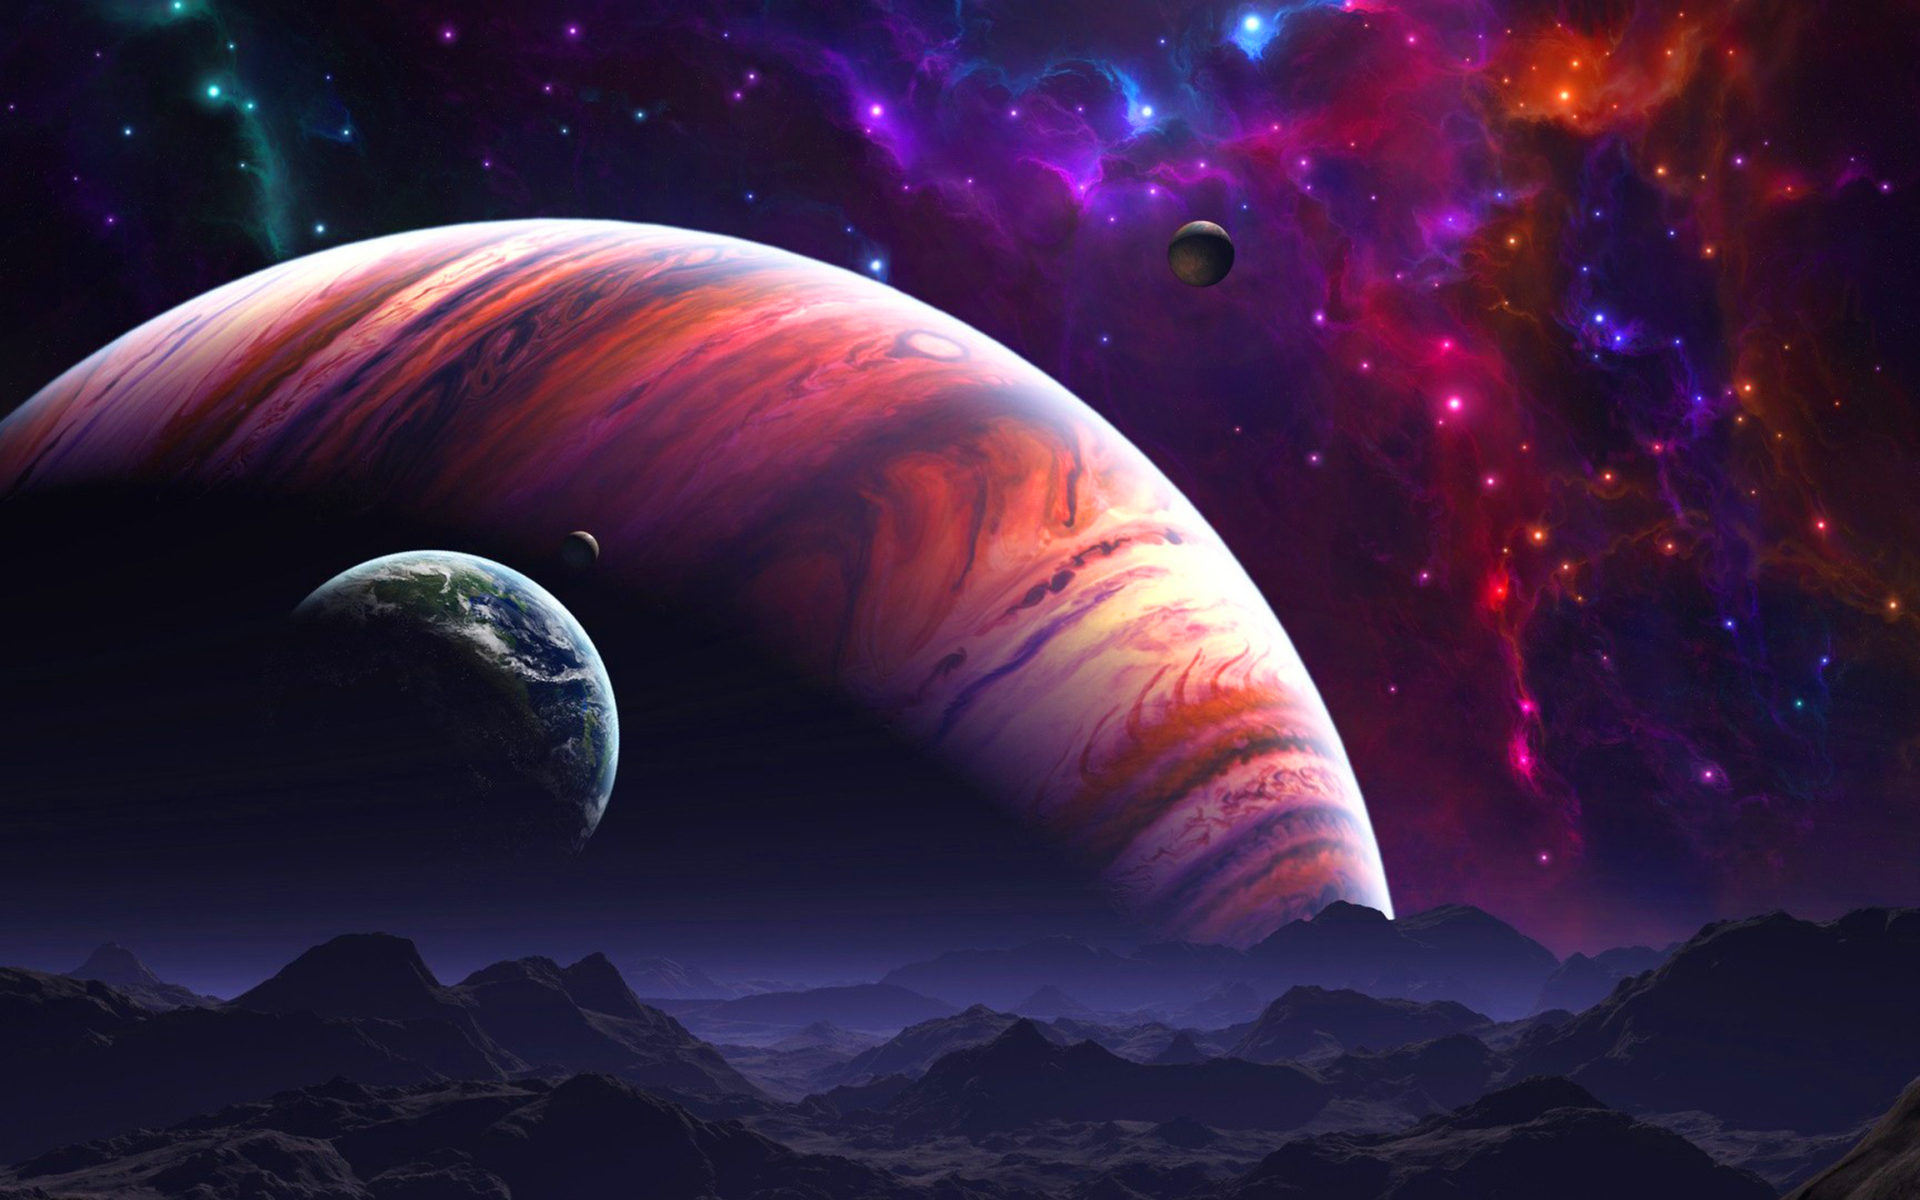 3d Moving Wallpapers City Lights Space Art Nebula Wallpaper Wallpapers13 Com